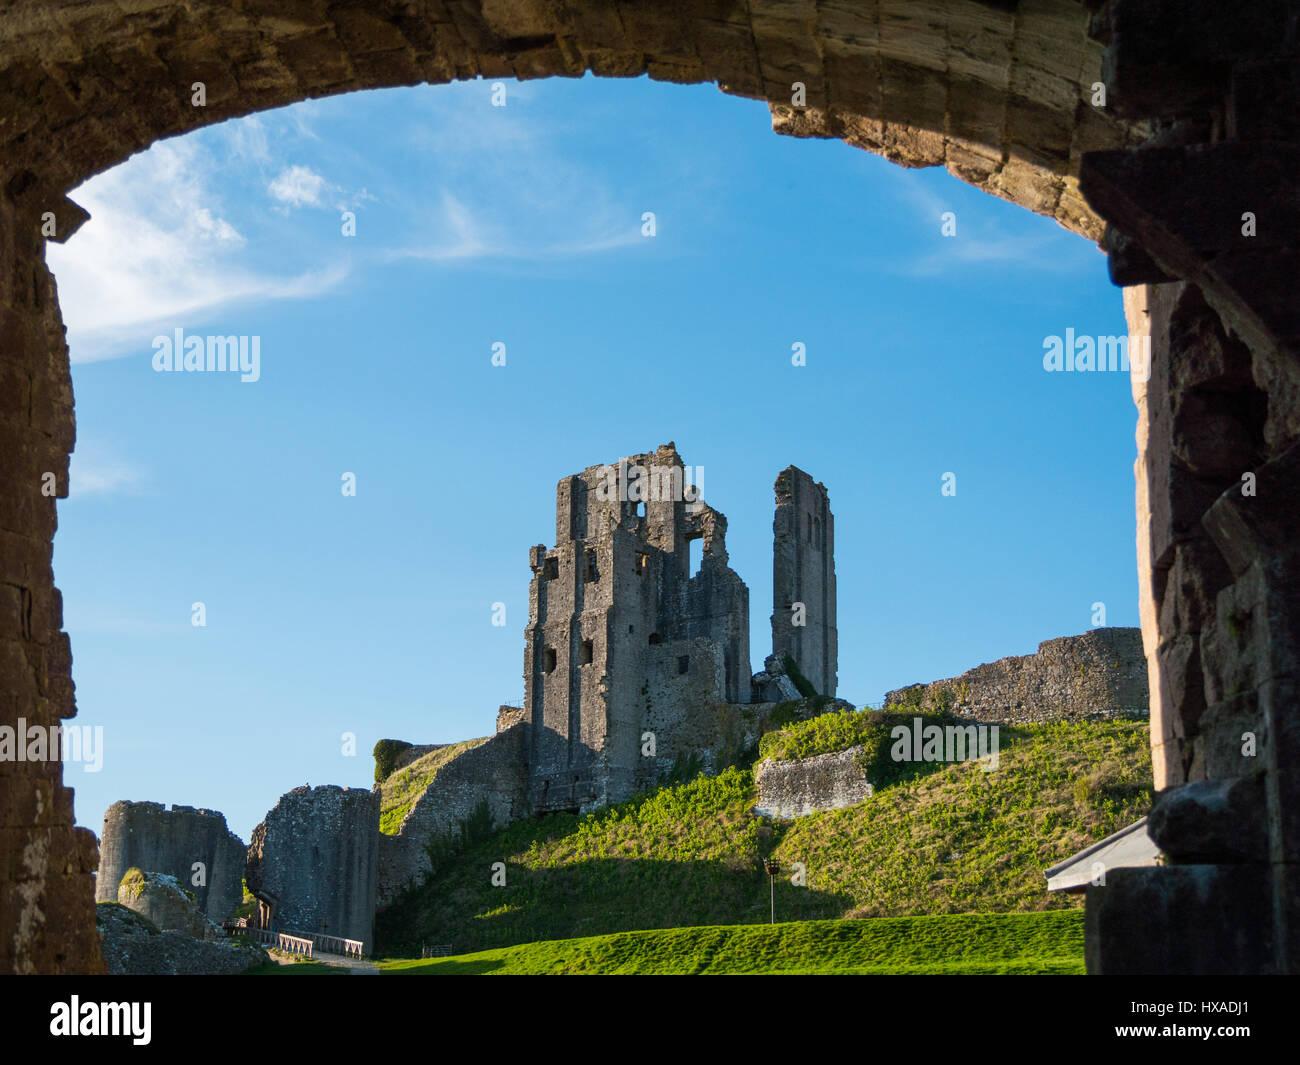 Die historischen Remainds der Corfe Castle, Corfe Castle, Isle of Purbeck, Dorset, Großbritannien Stockbild